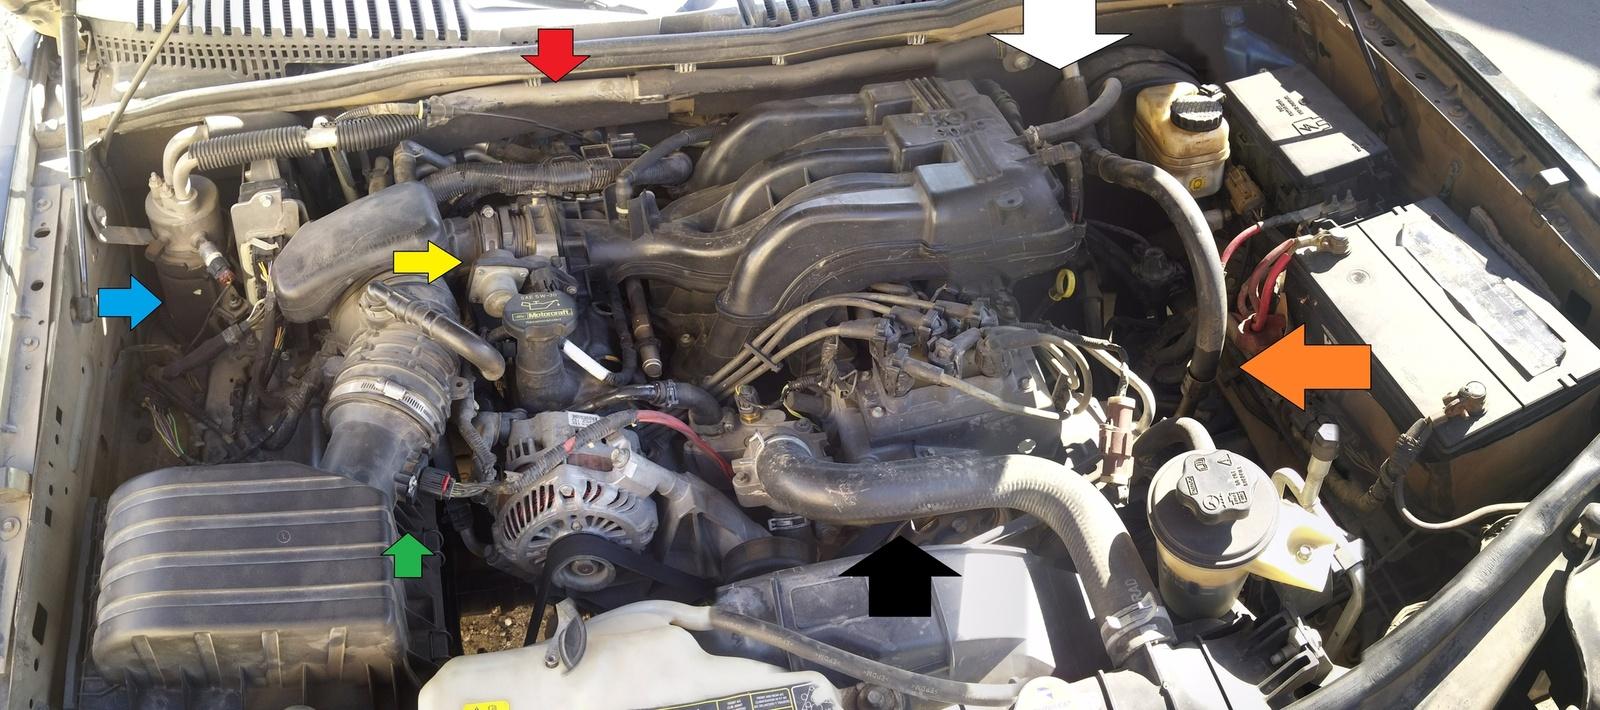 Ford Serpentine Belt Diagram Additionally Ford Bronco Wiring Diagram